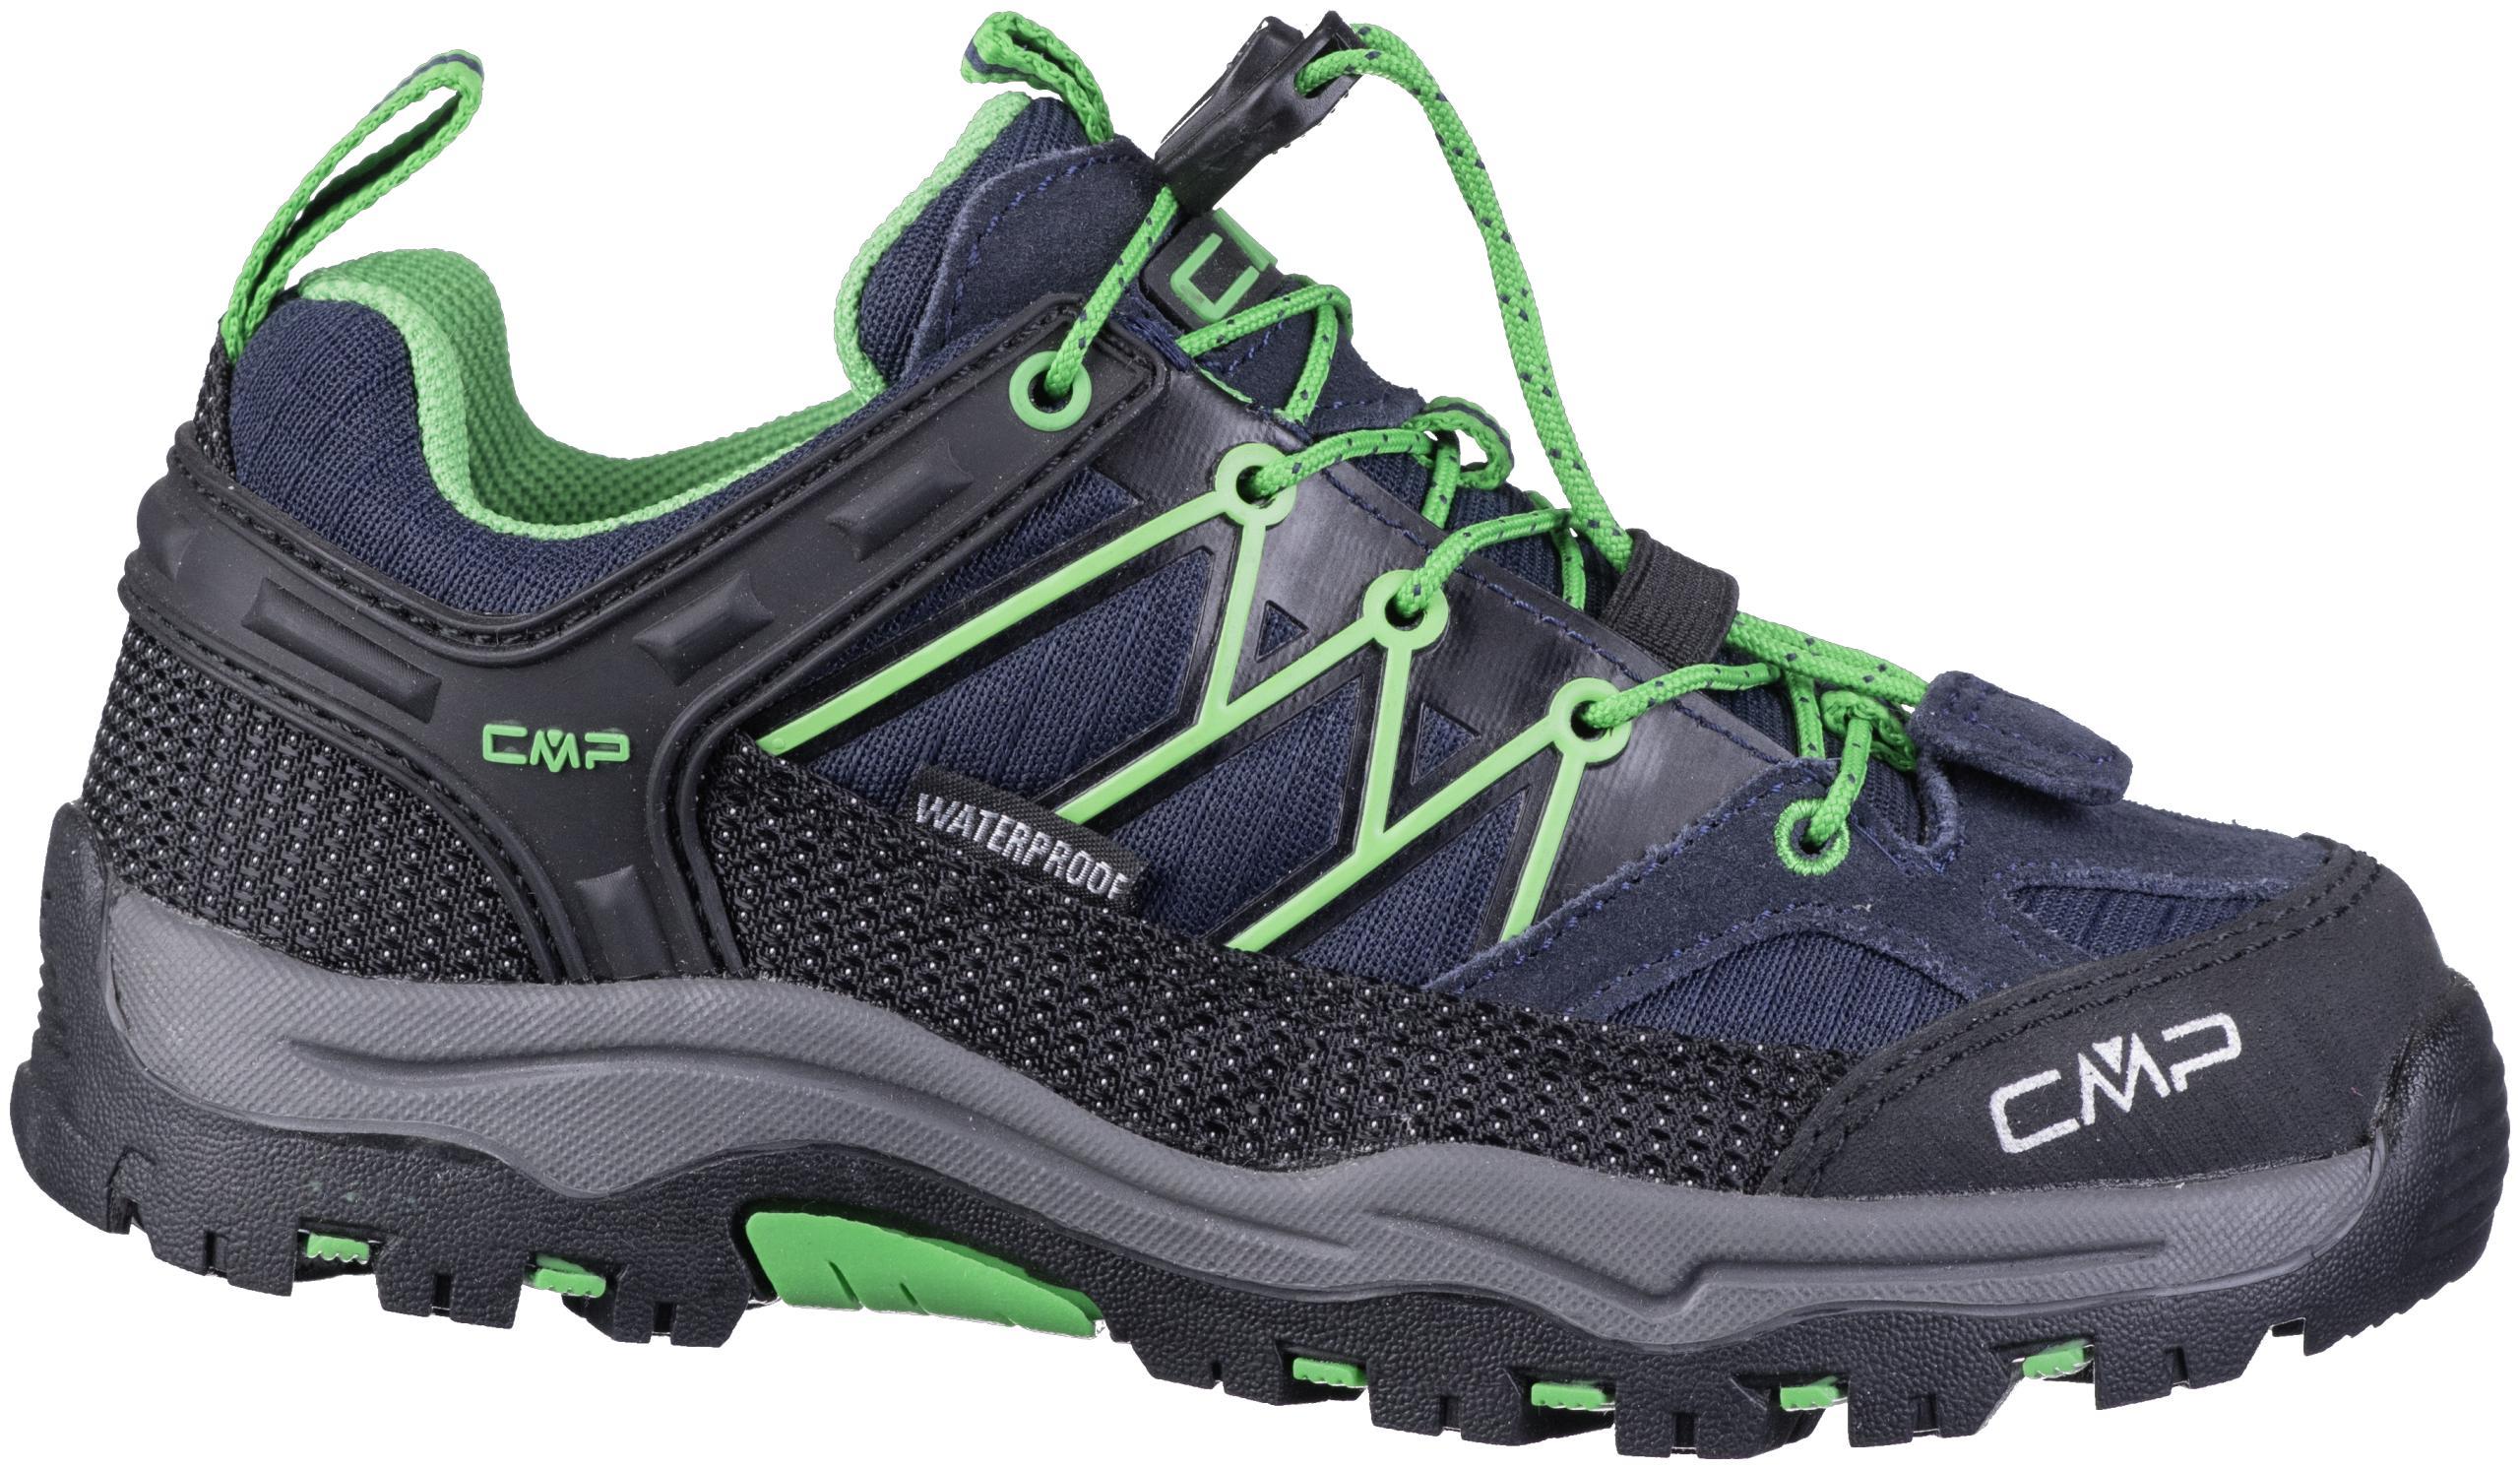 Spohr Schuhe